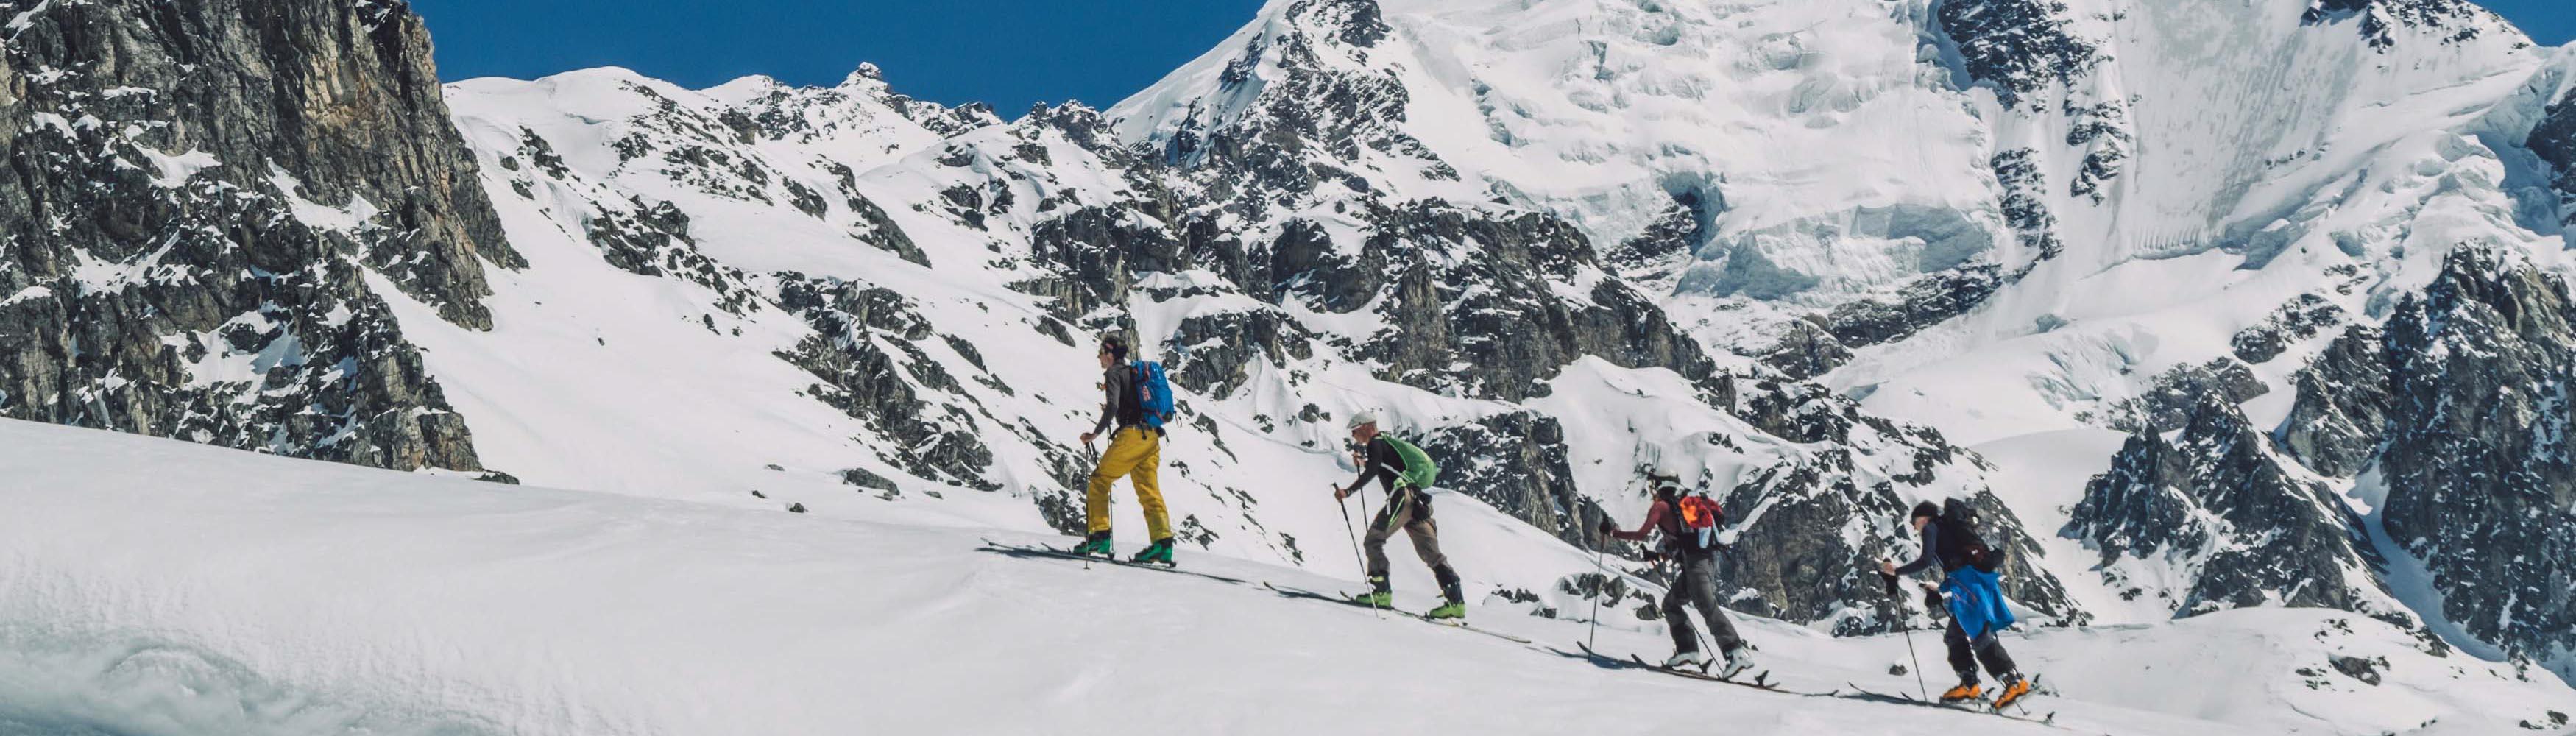 Skitourengehen in Georgien